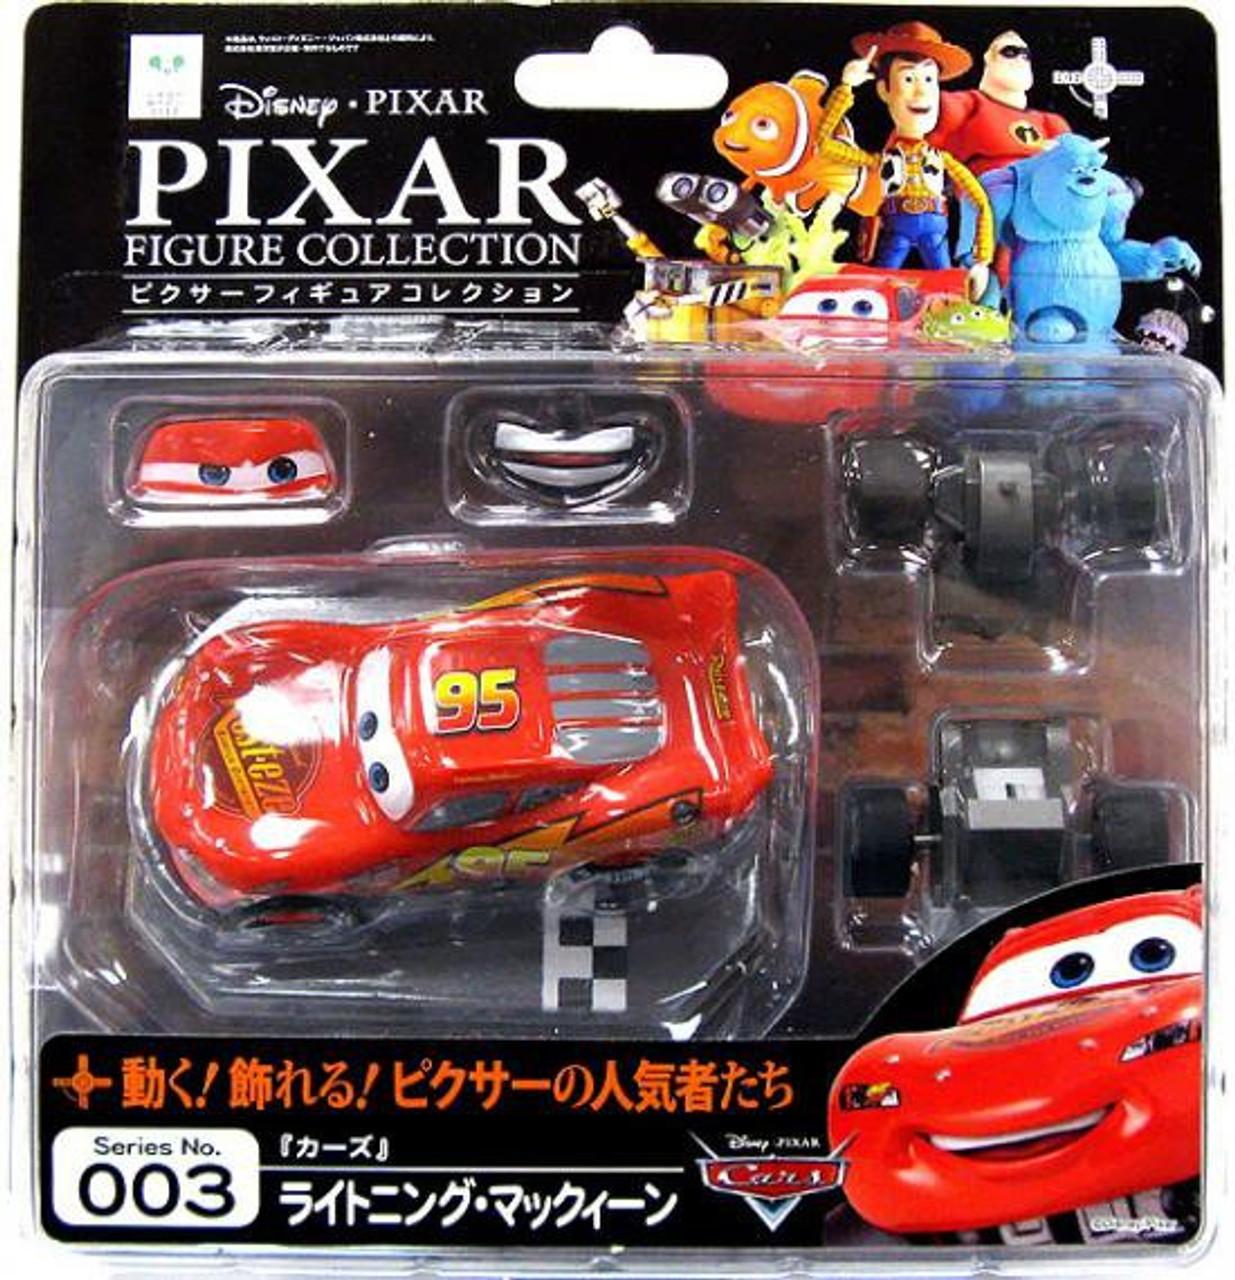 Disney Pixar Cars Revoltech Pixar Figure Collection Lightning